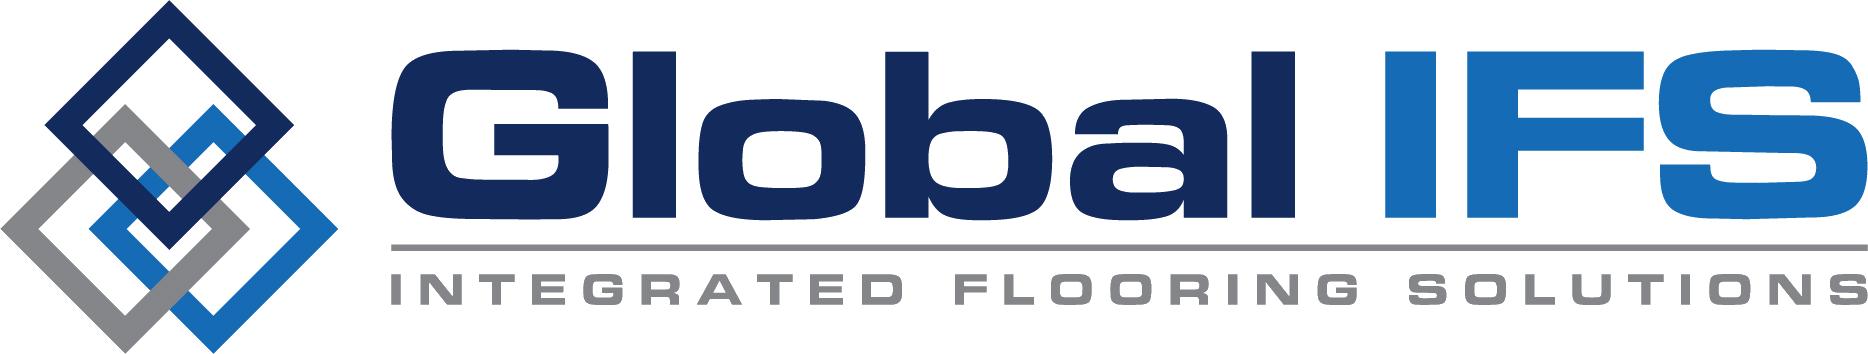 Global_IFS_logo.png